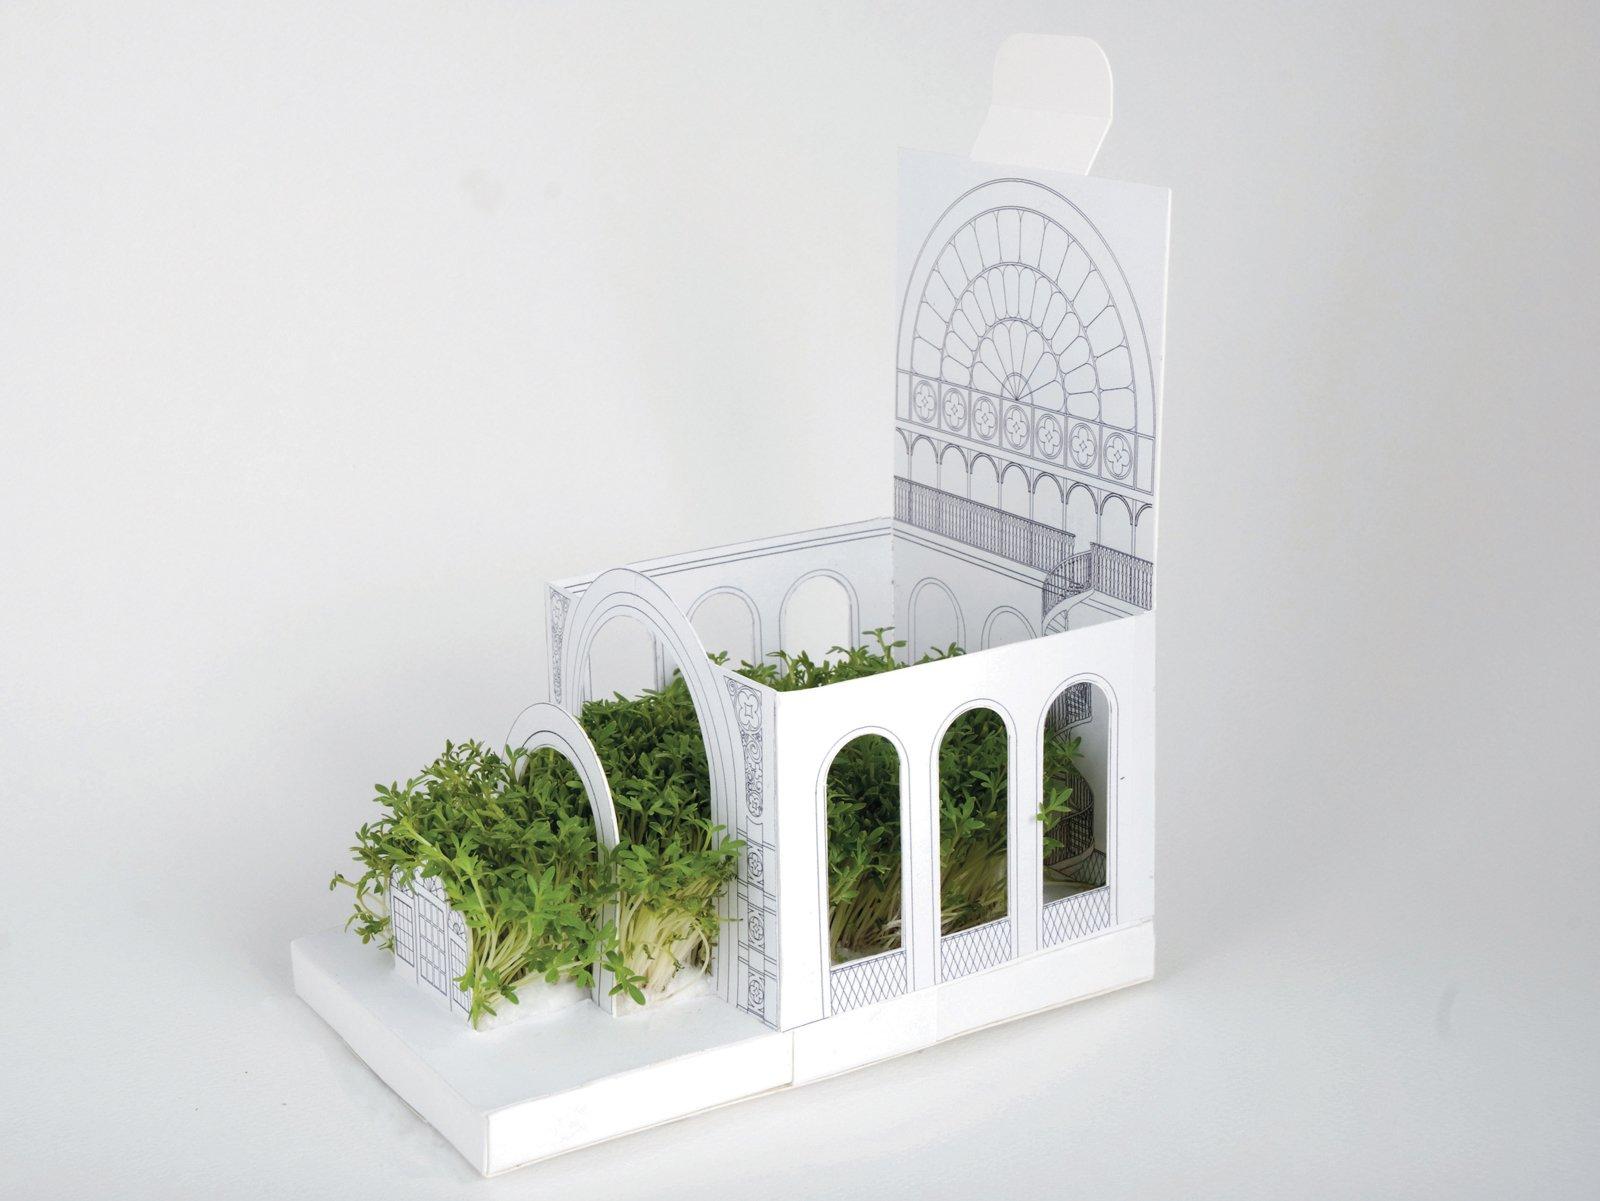 "Botanical Carden by Postcarden  Search ""전주오피《《www.MAT55.com》》⊀달밤⊁대비∥전주오피ಓ전주룸사롱ꌛ전주출장ꌙ전주Hugetelꏎ전주업소✘전주안마"" from Outside the Box: Cardboard Design"